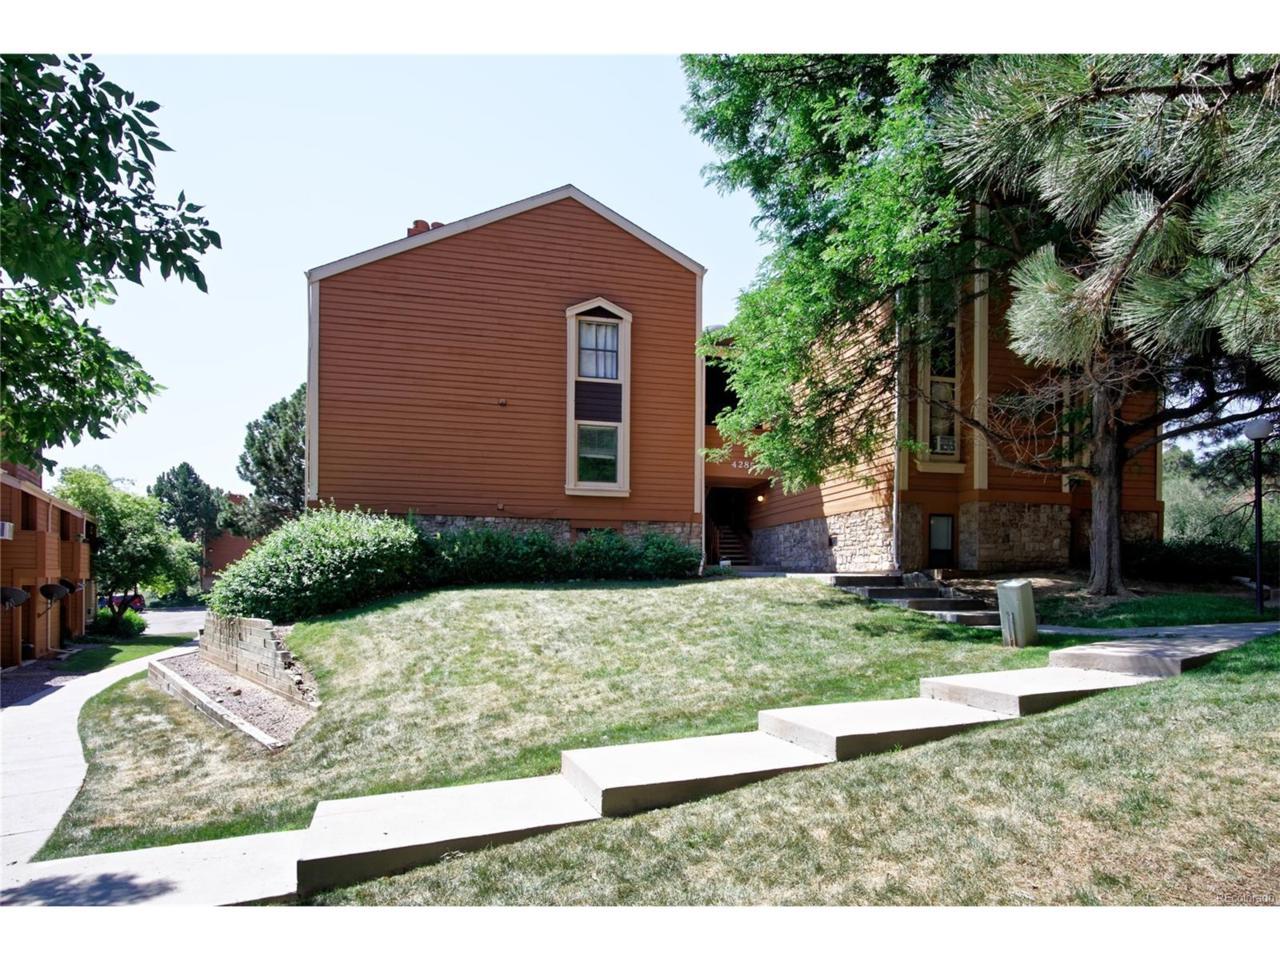 4285 S Salida Way #2, Aurora, CO 80013 (MLS #3103068) :: 8z Real Estate